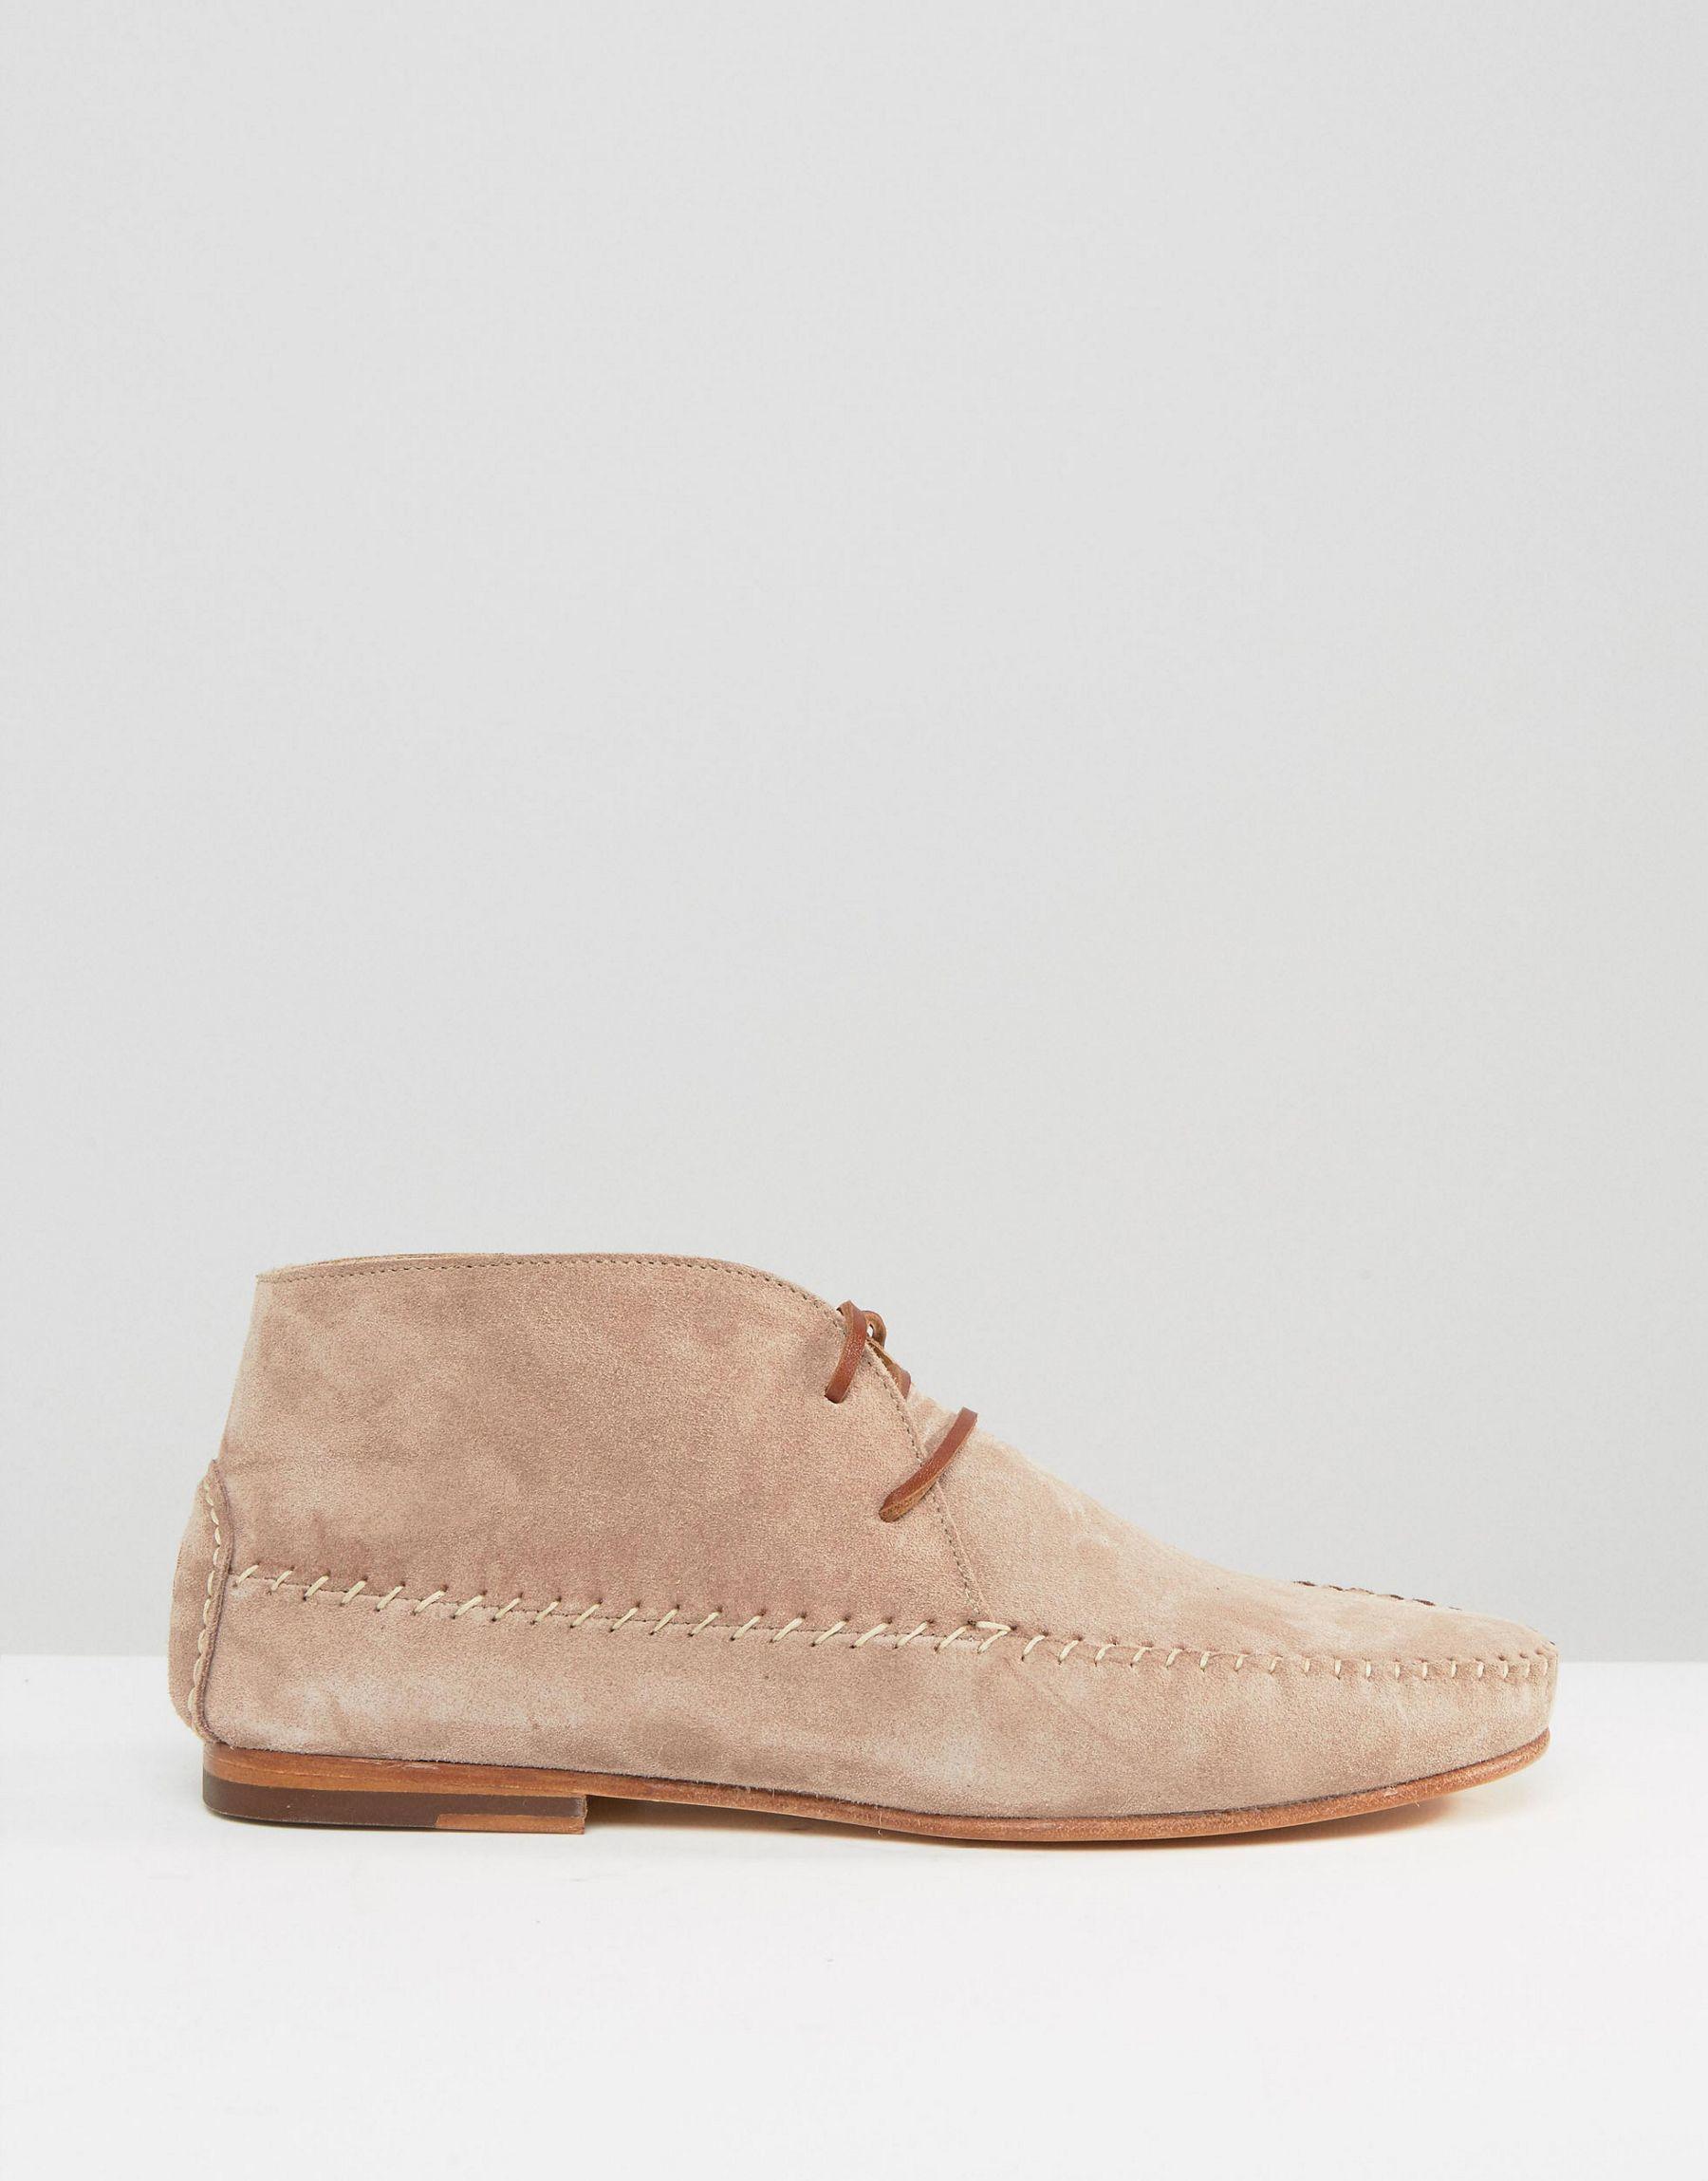 Bobbies Shoes Canada